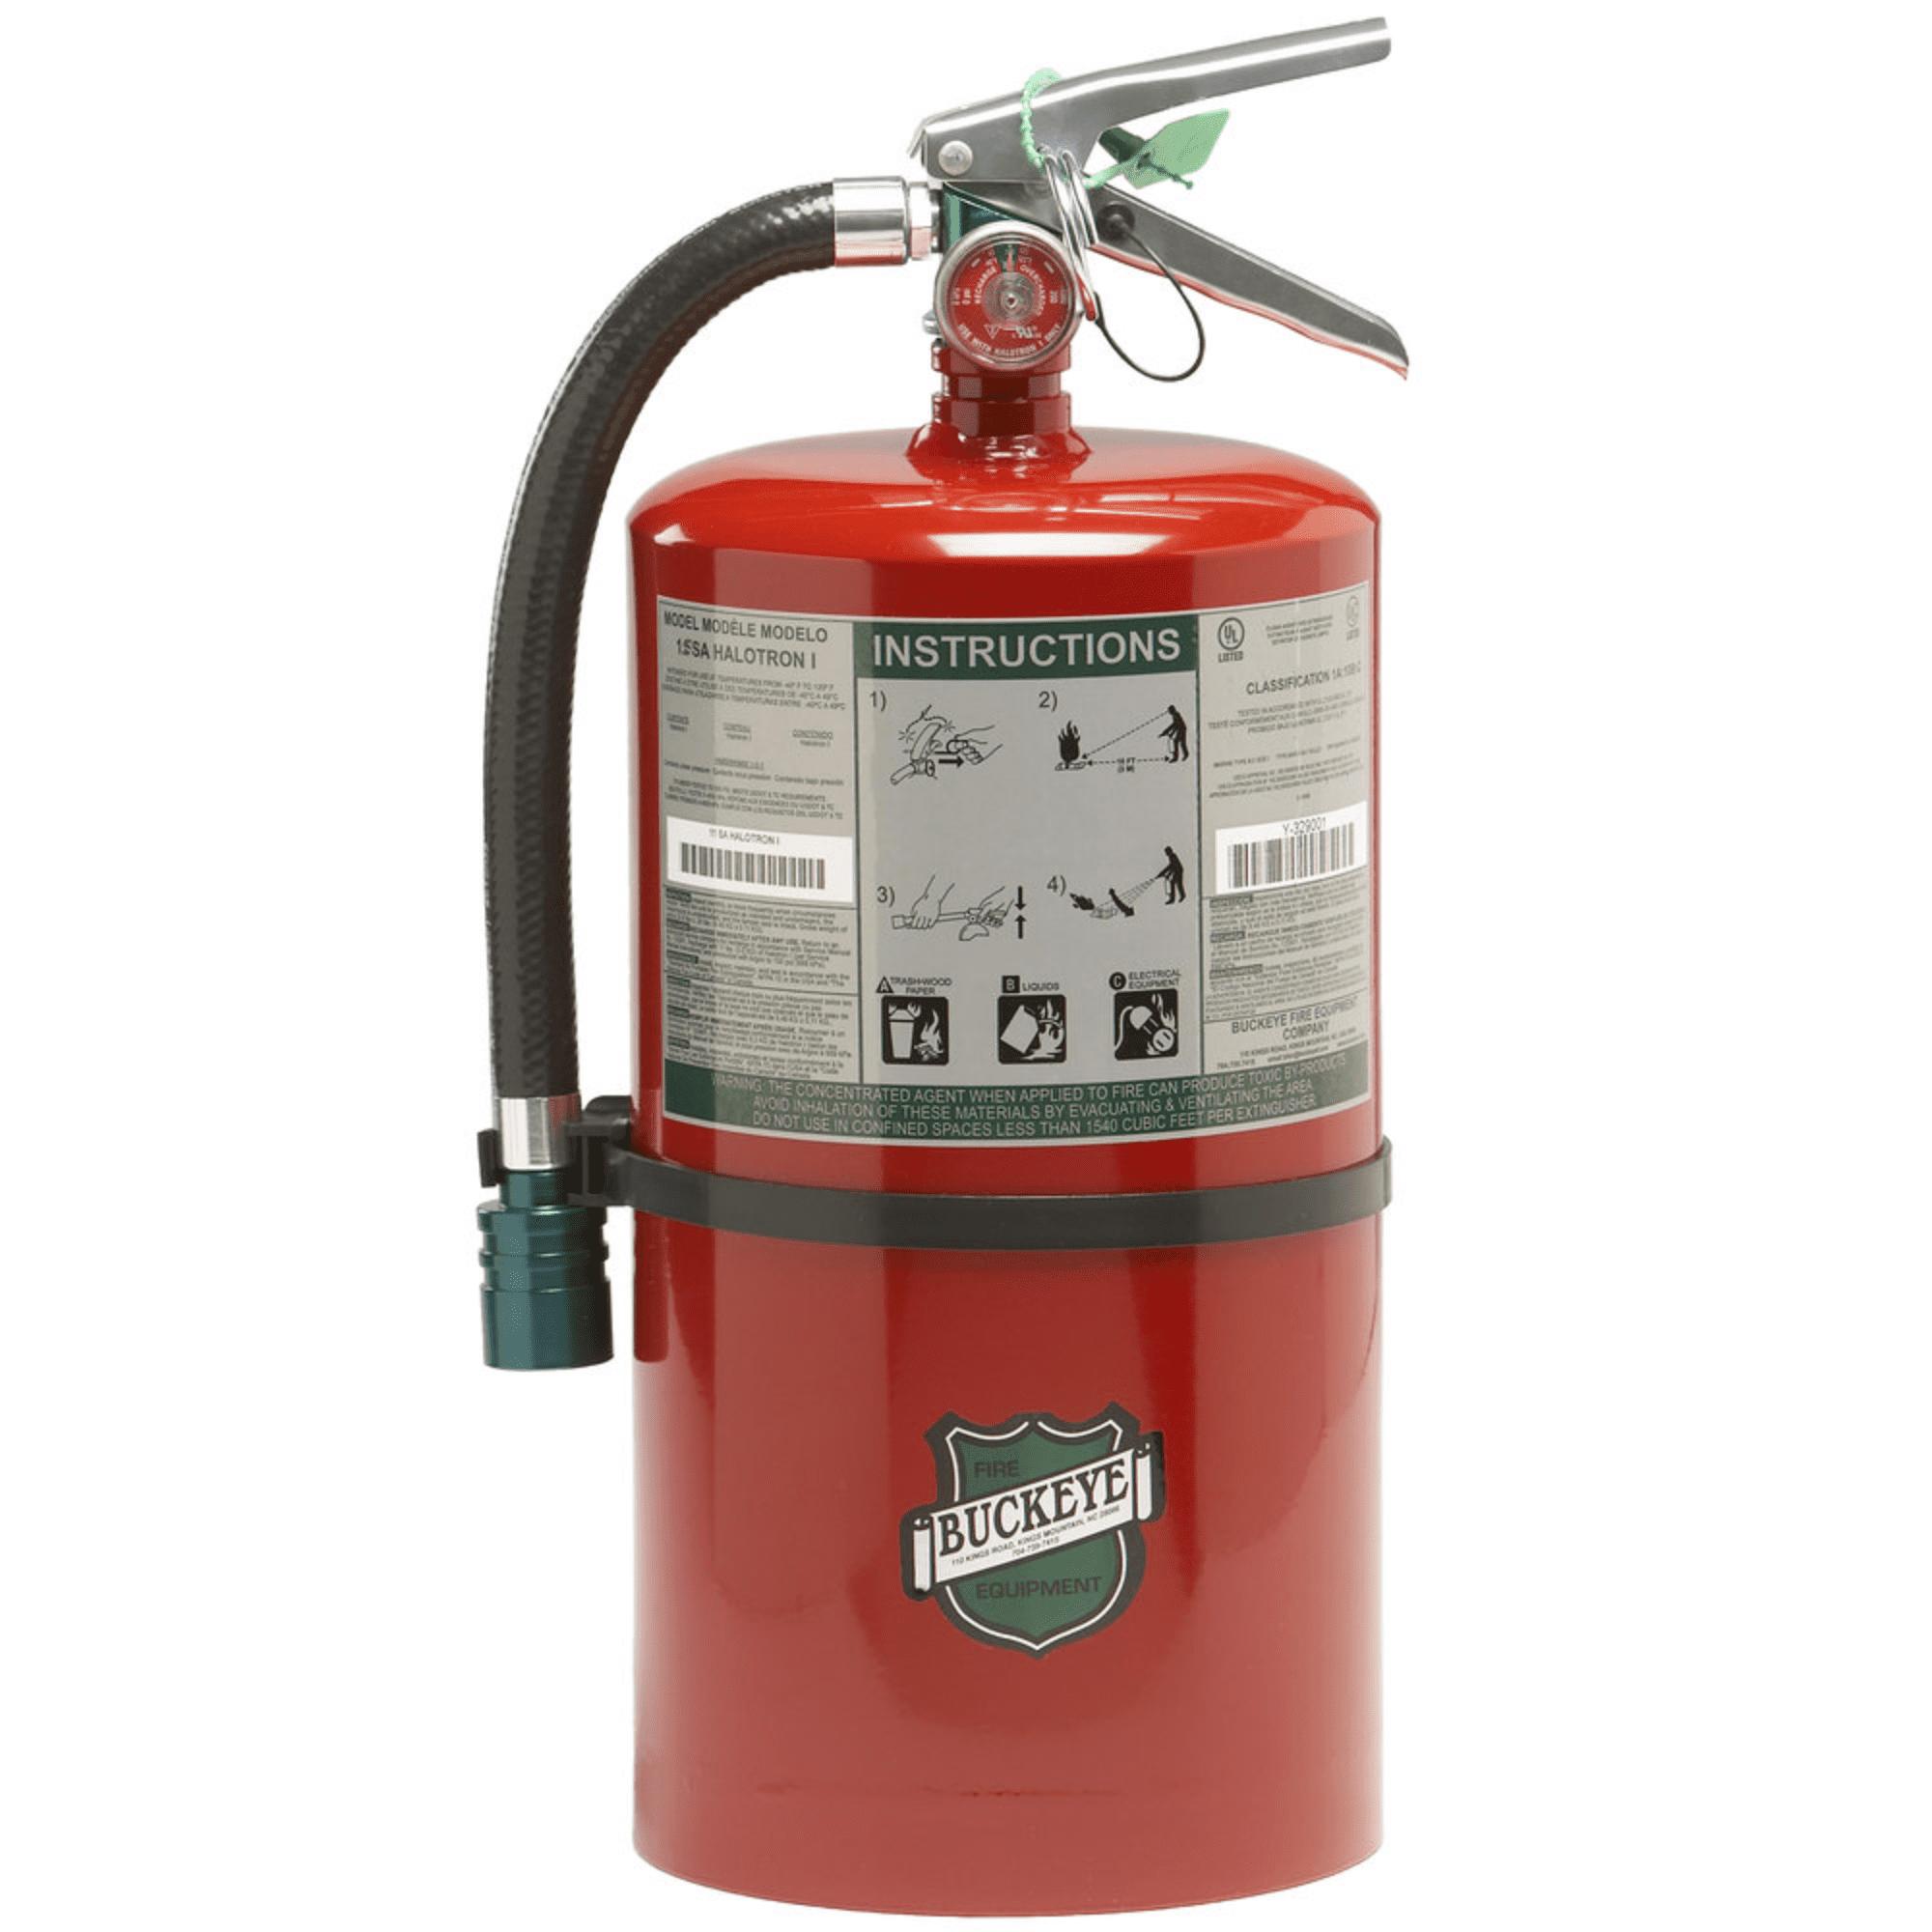 Buckeye Fire Extinguisher, 11 lb Halotron Fire Extinguish...